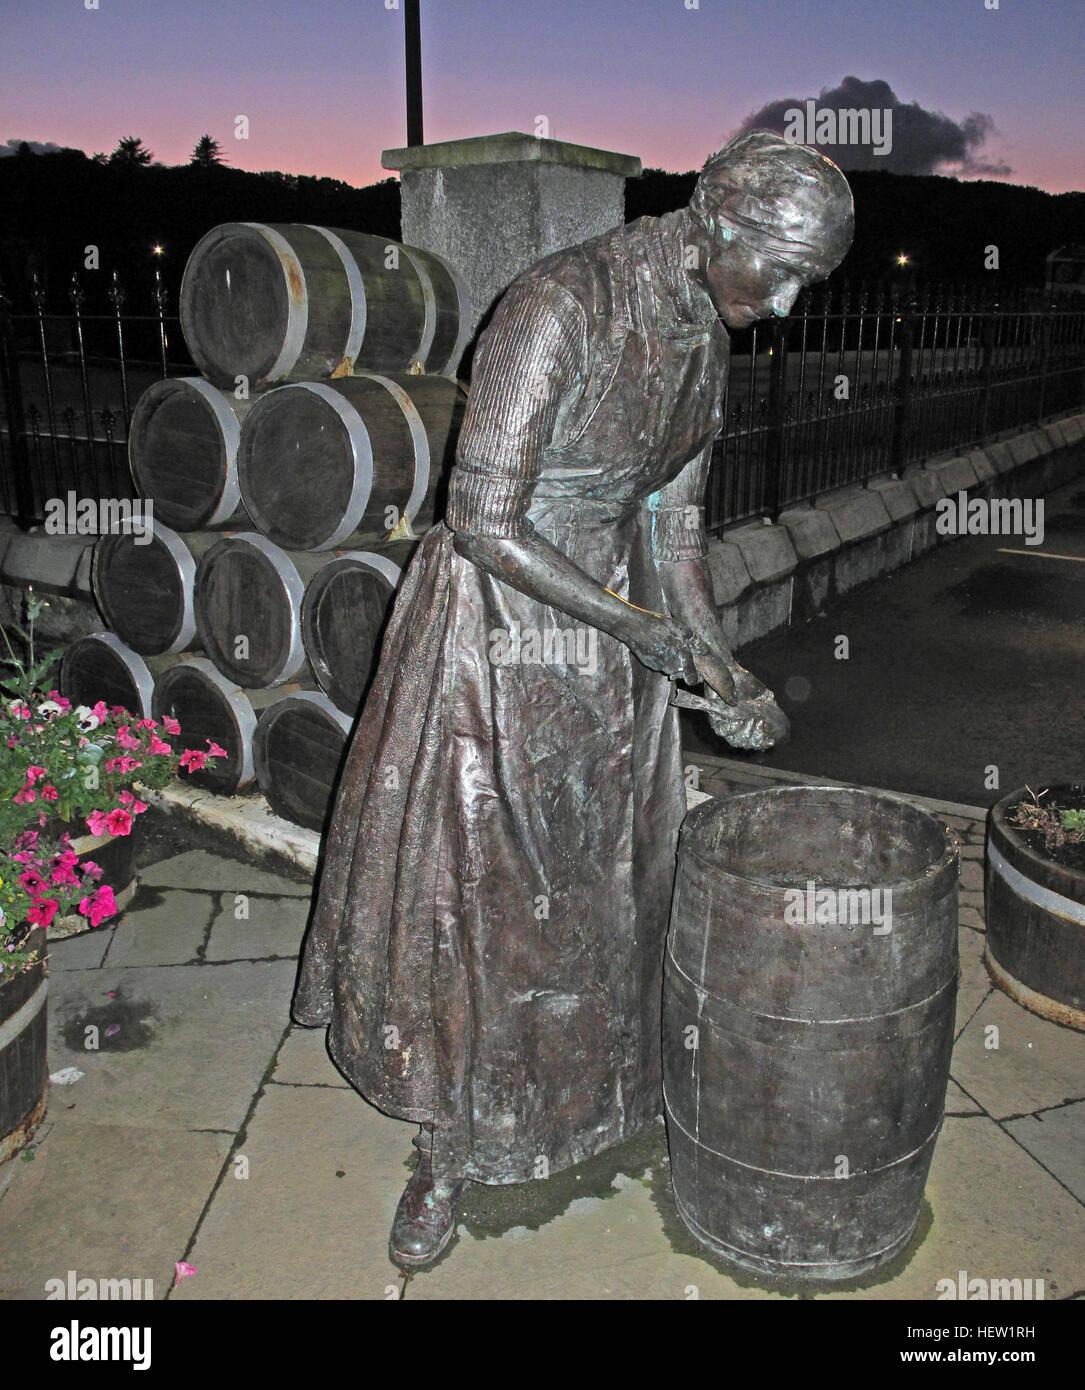 Stornoway Isle Of Lewis Herring Girl Am Hafen statue at dusk - Stock Image